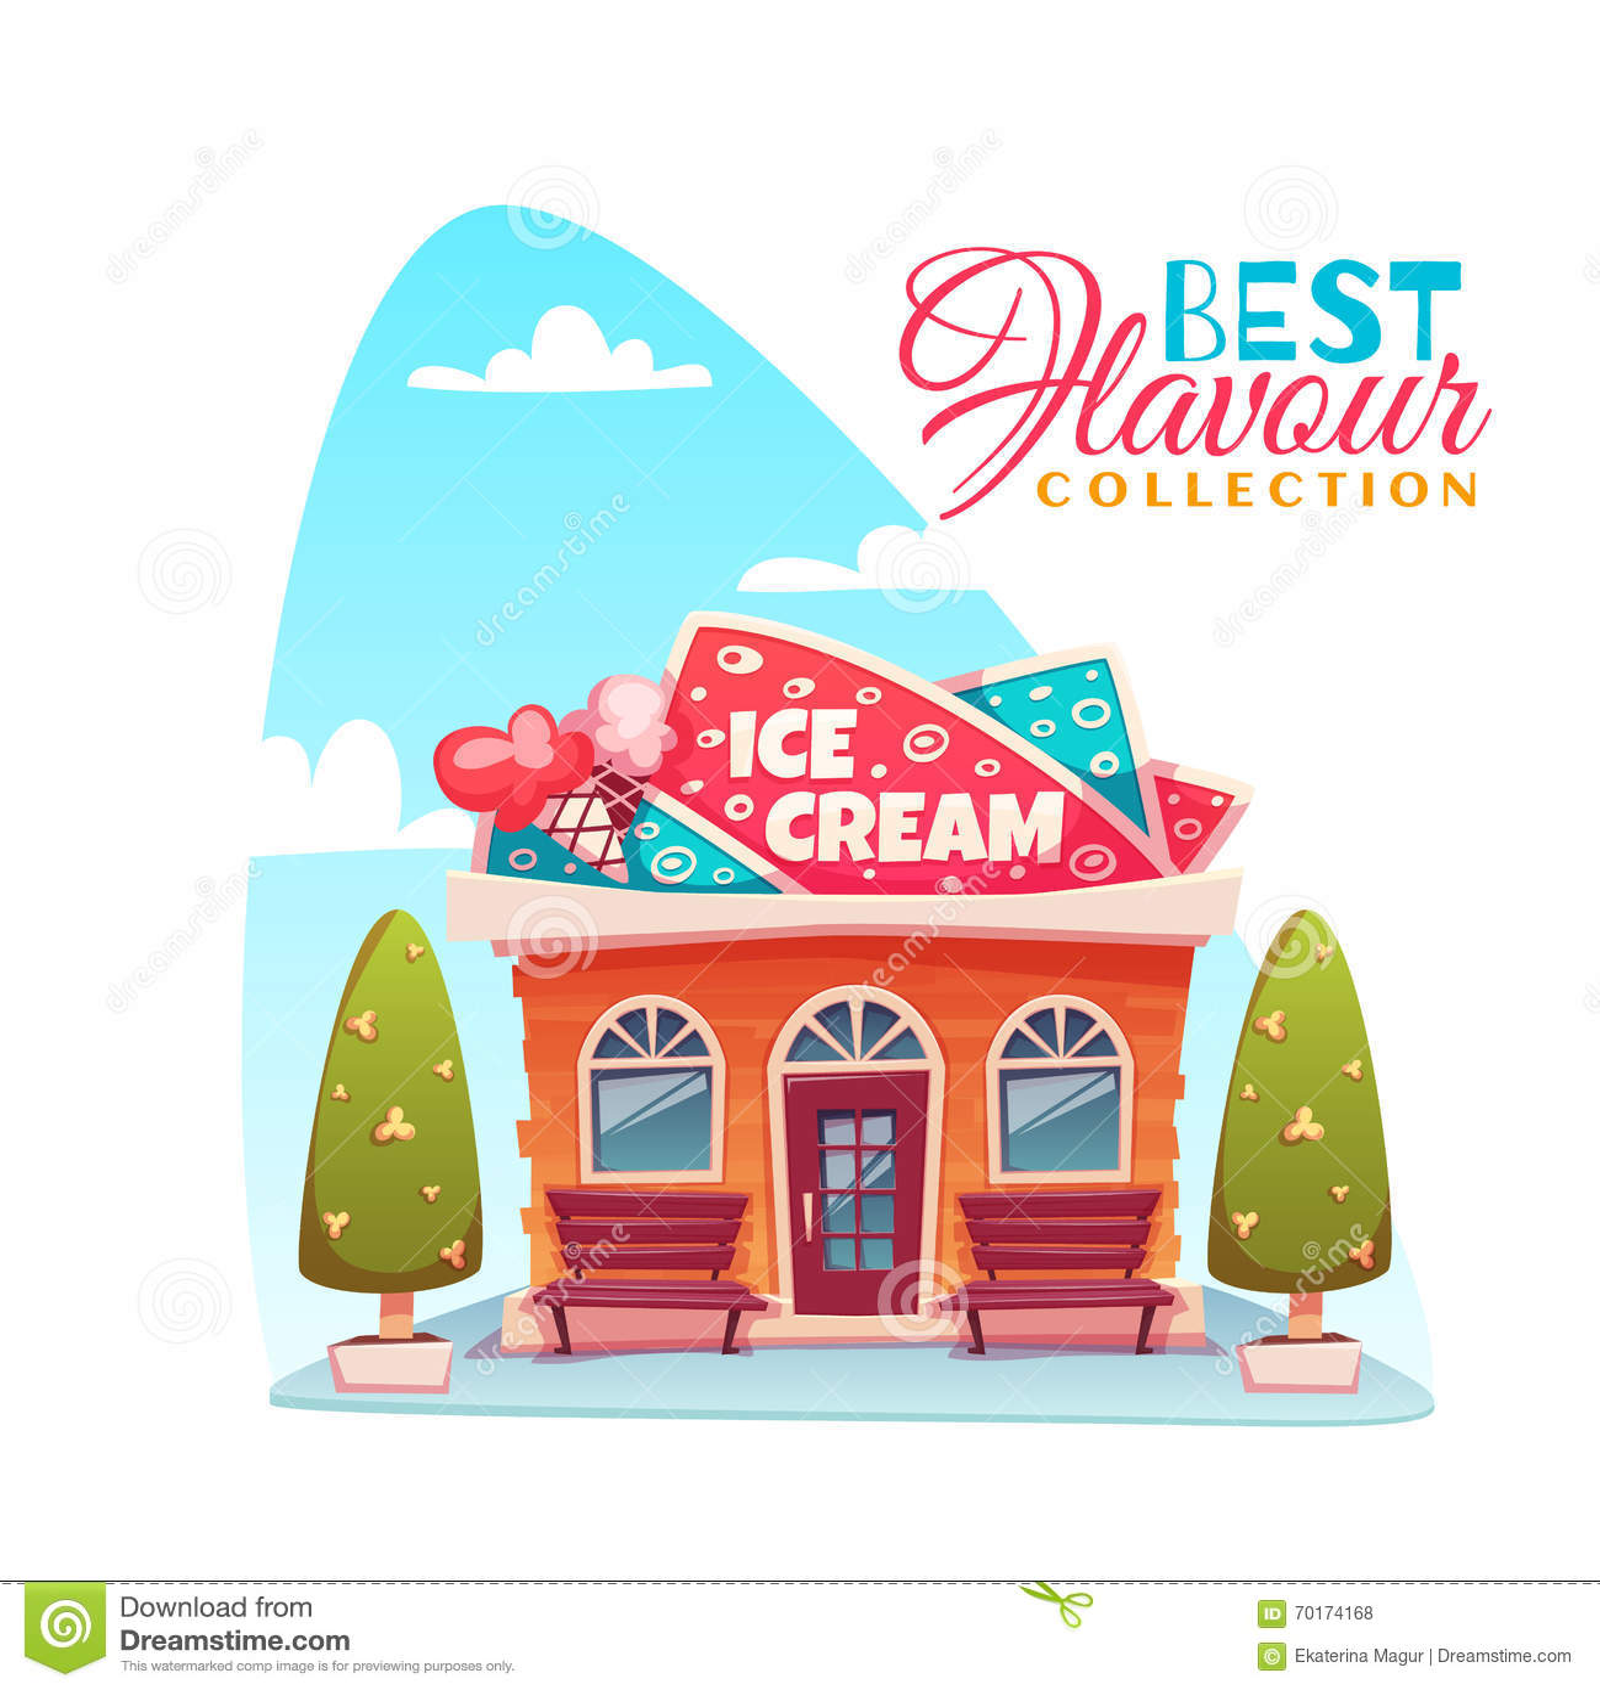 Vector Illustration Of Ice Cream Shop Building Cartoon